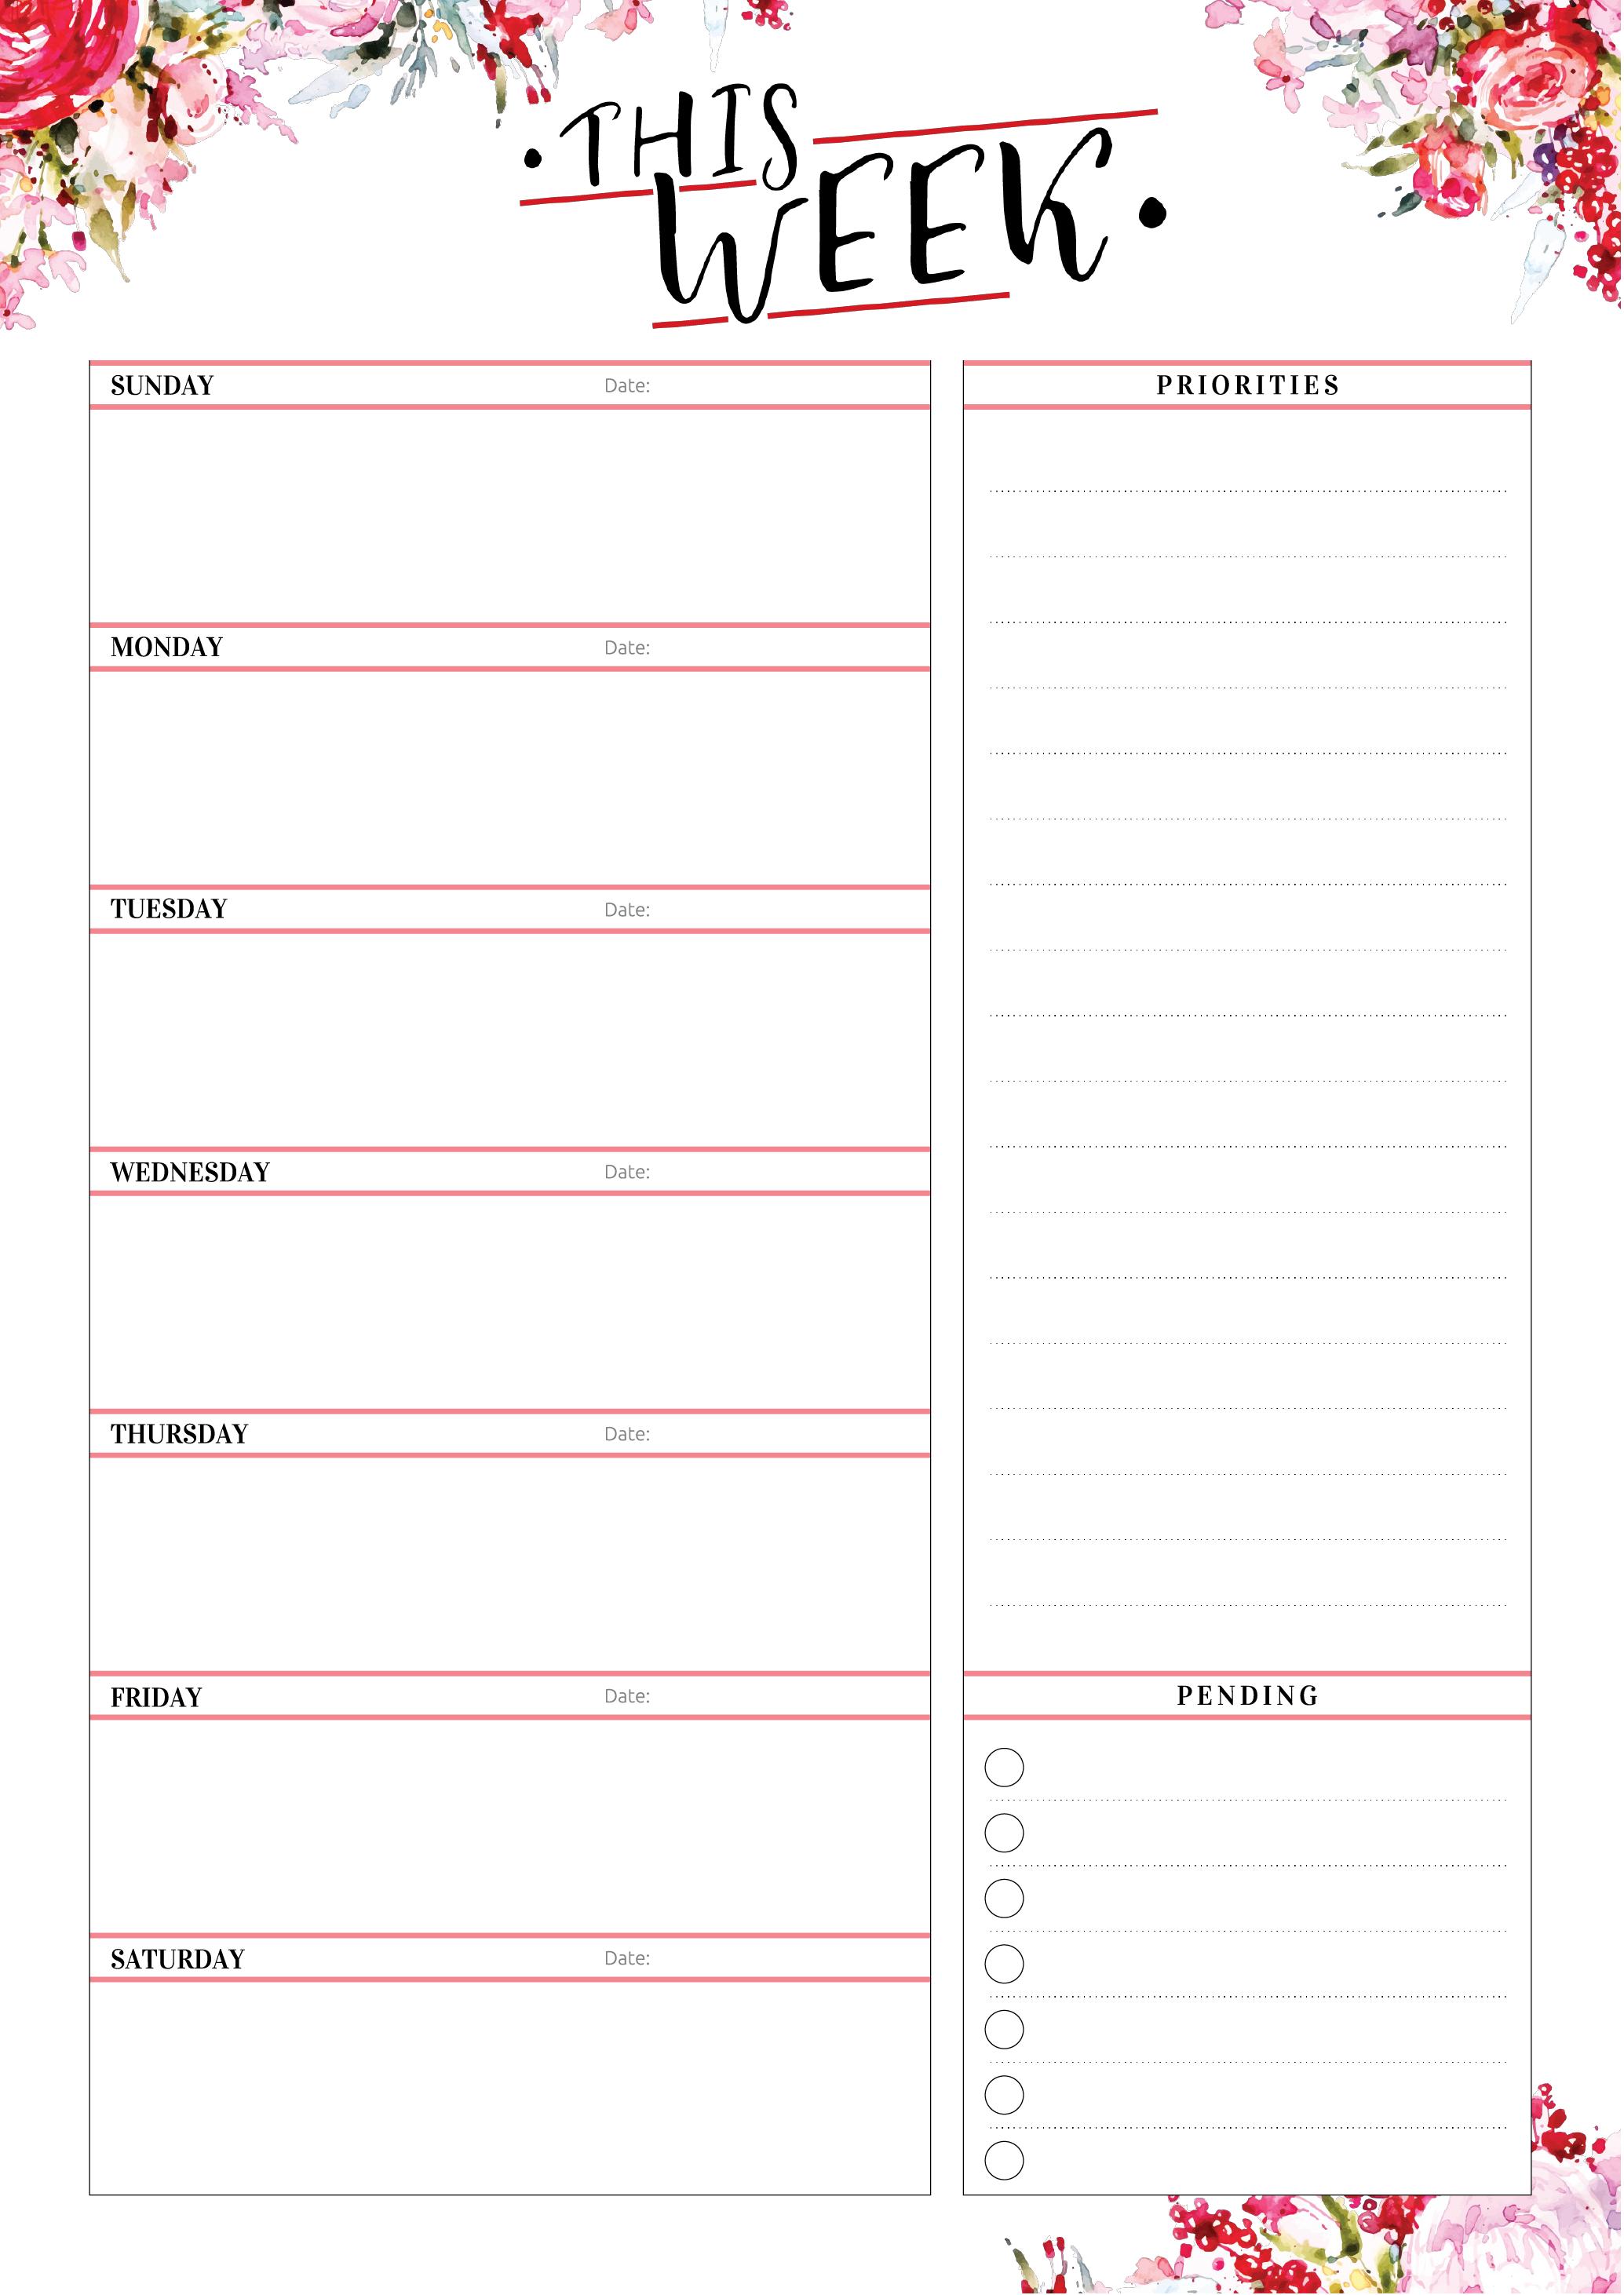 Free Printable Weekly Planner With Priorities Pdf Download Weekly Planner Template Weekly Planner Free Printable Weekly Planner Free